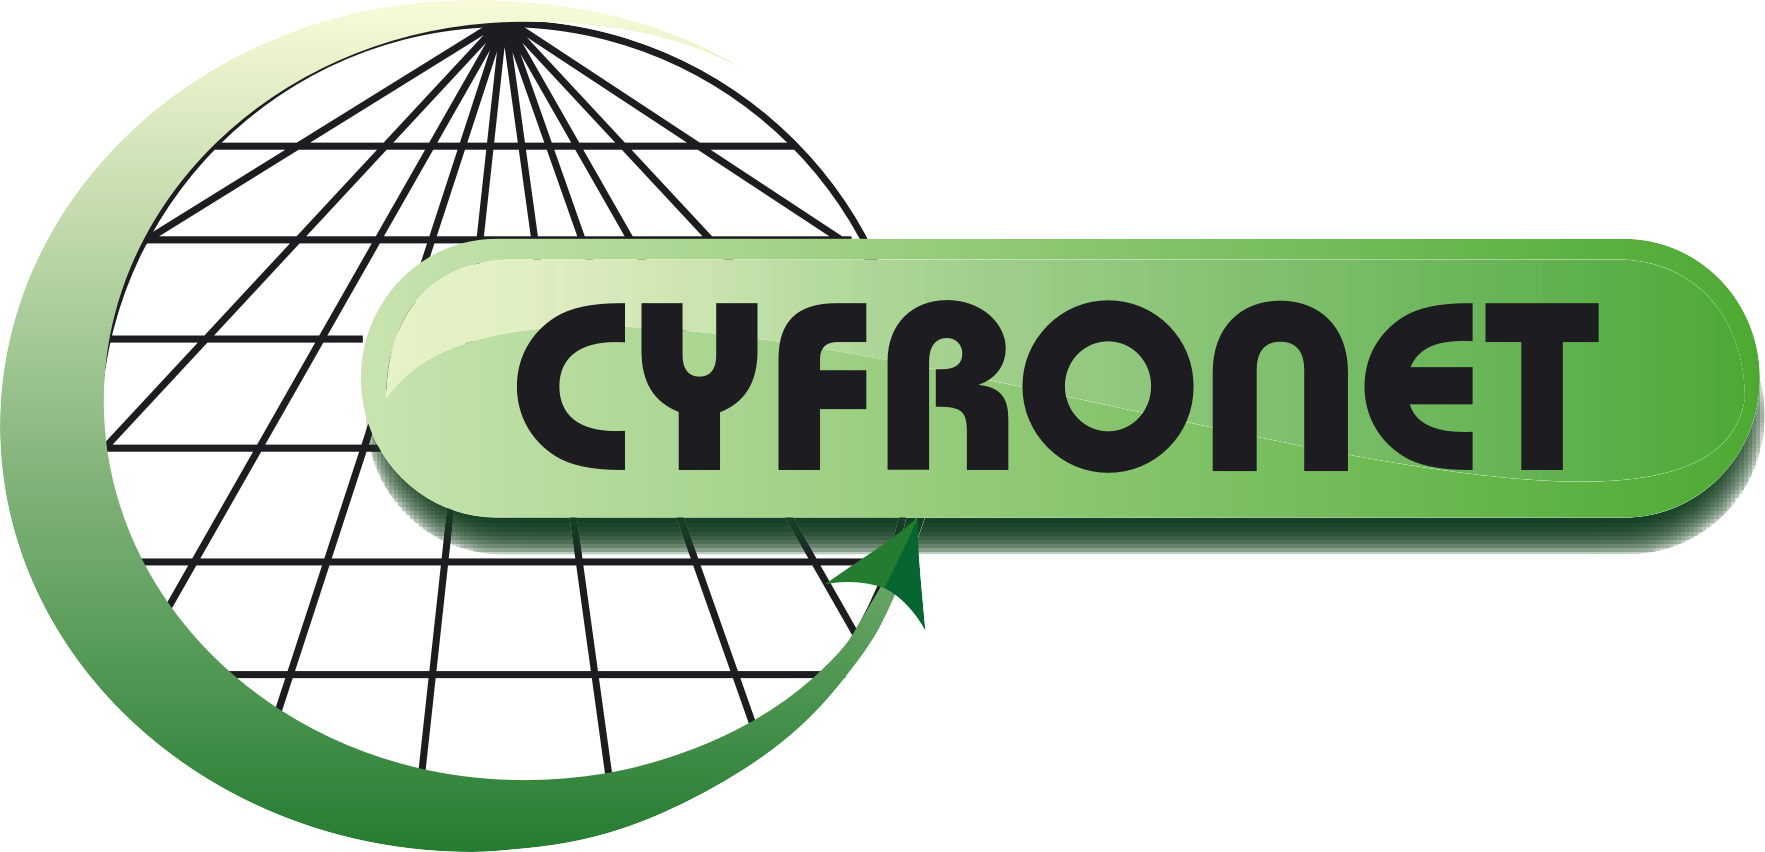 Cyfronet logo kolor